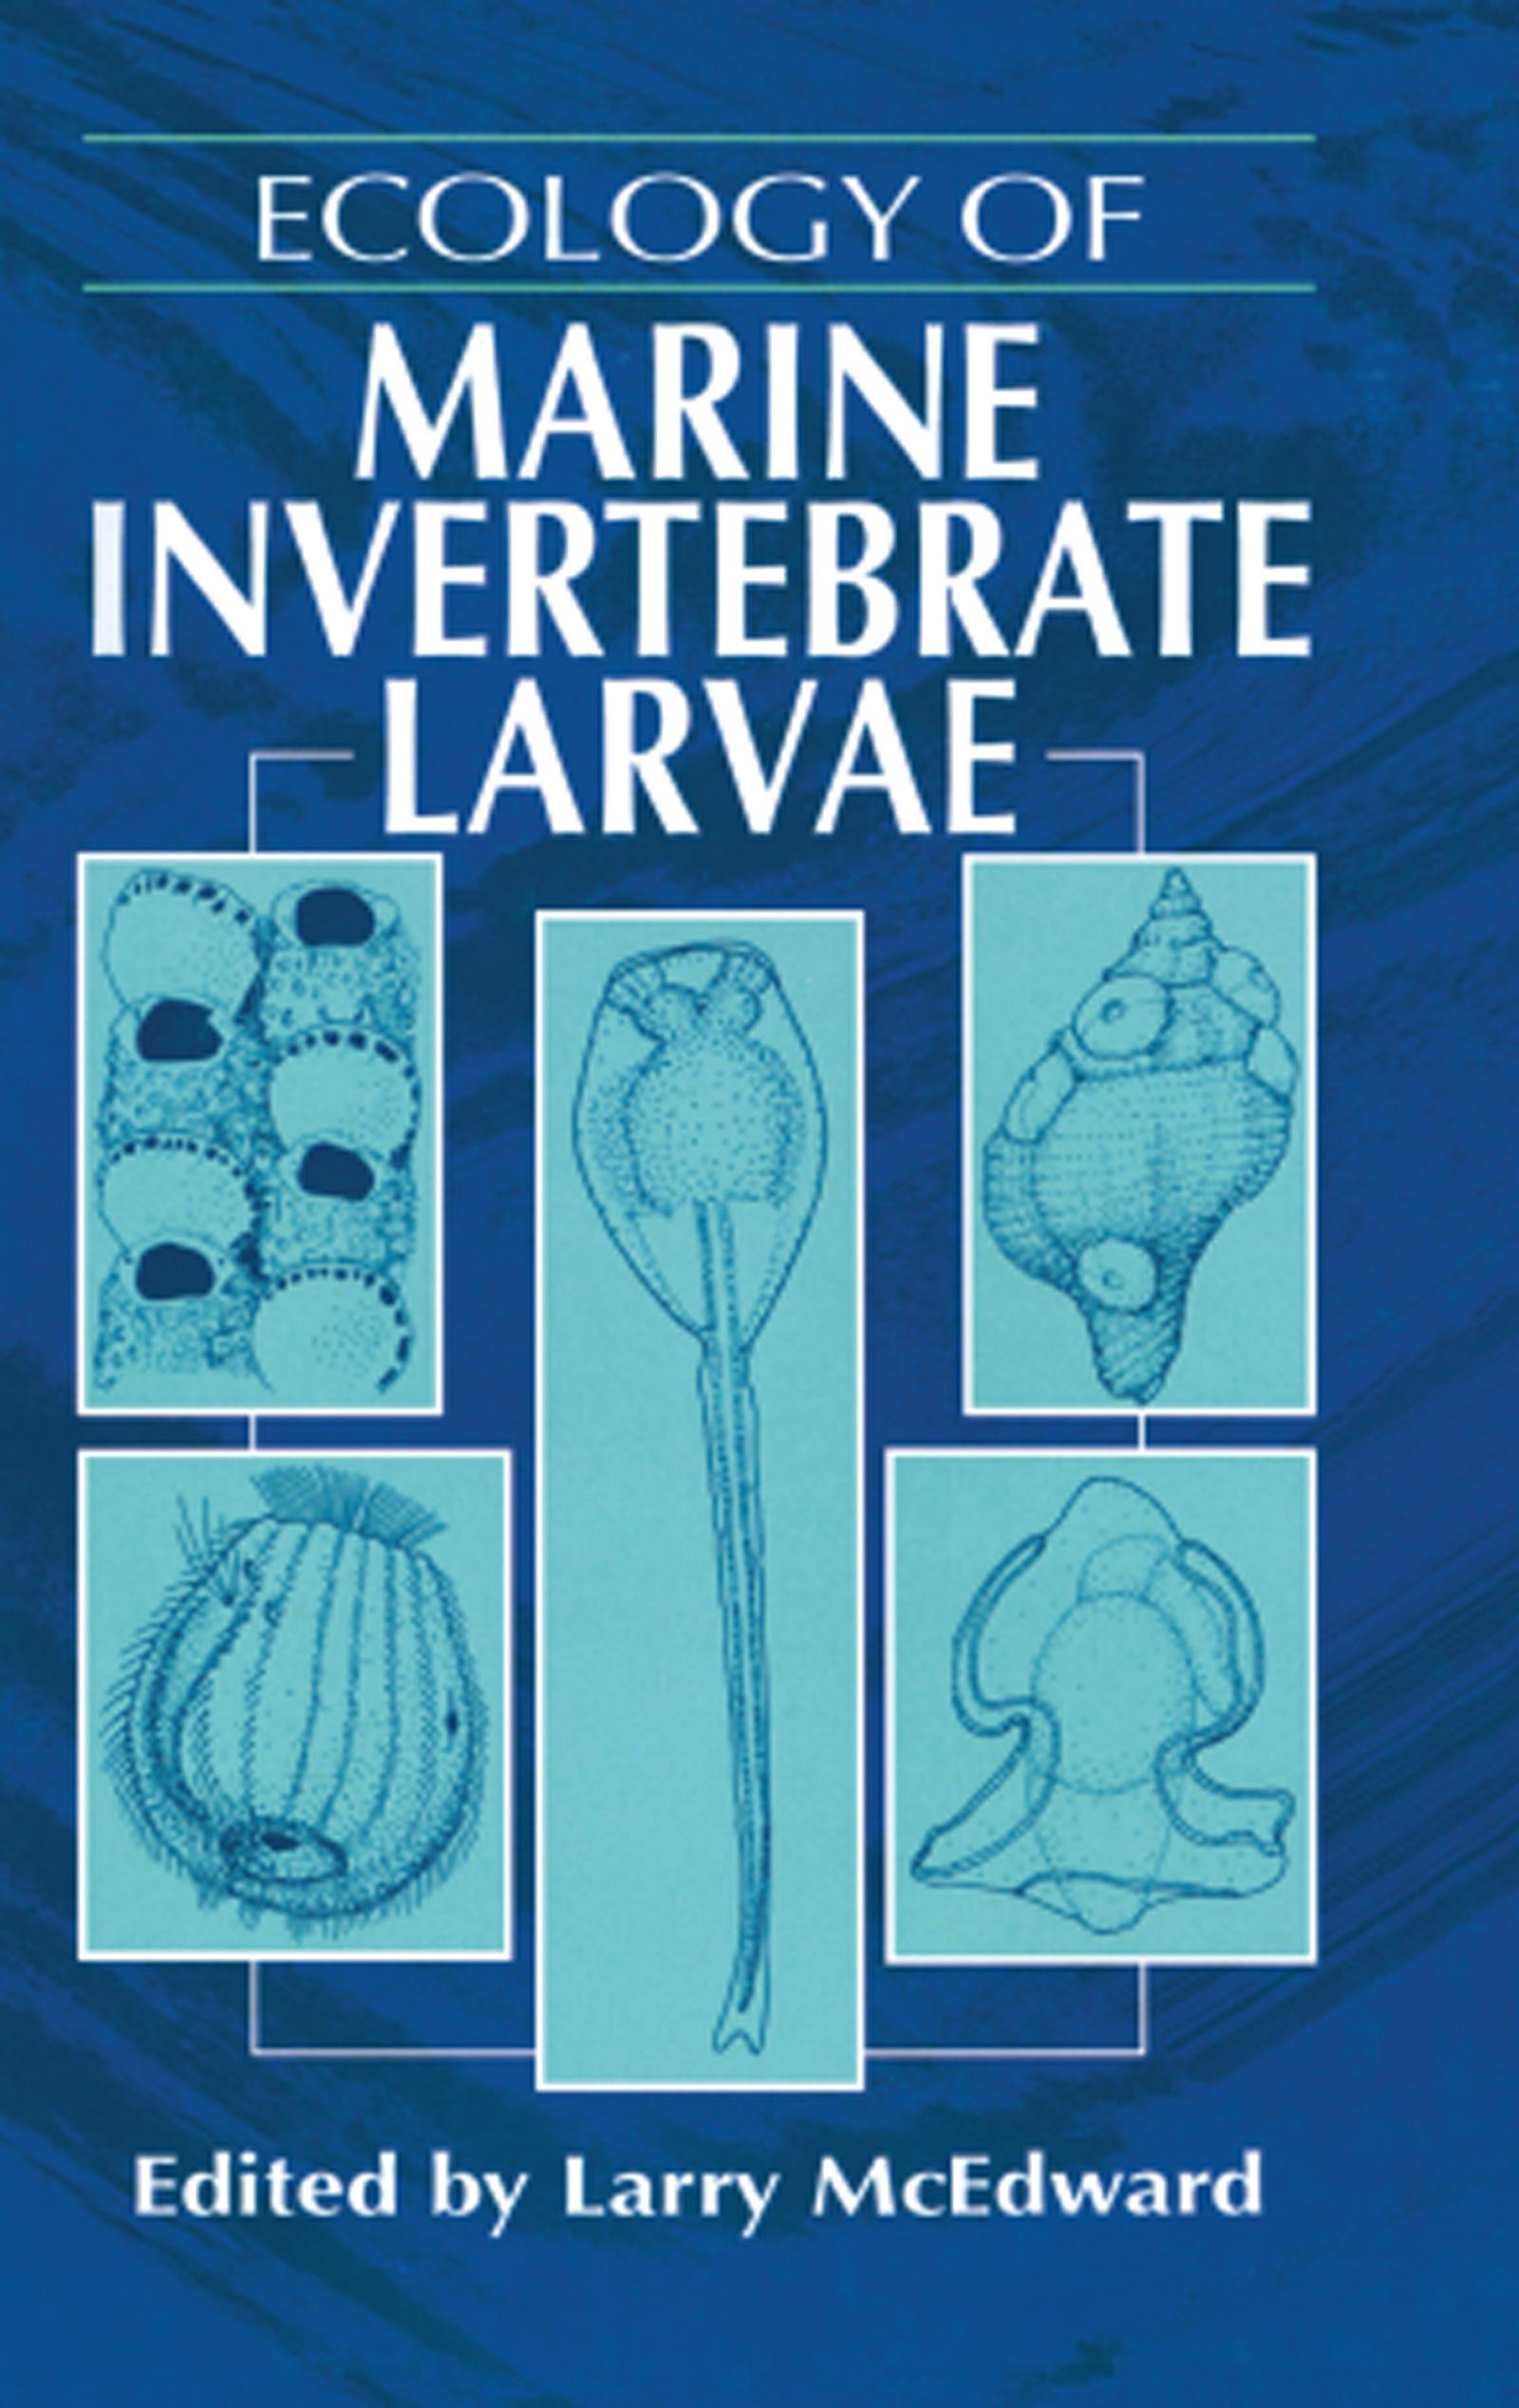 Ecology of Marine Invertebrate Larvae: 1st Edition (Hardback) book cover